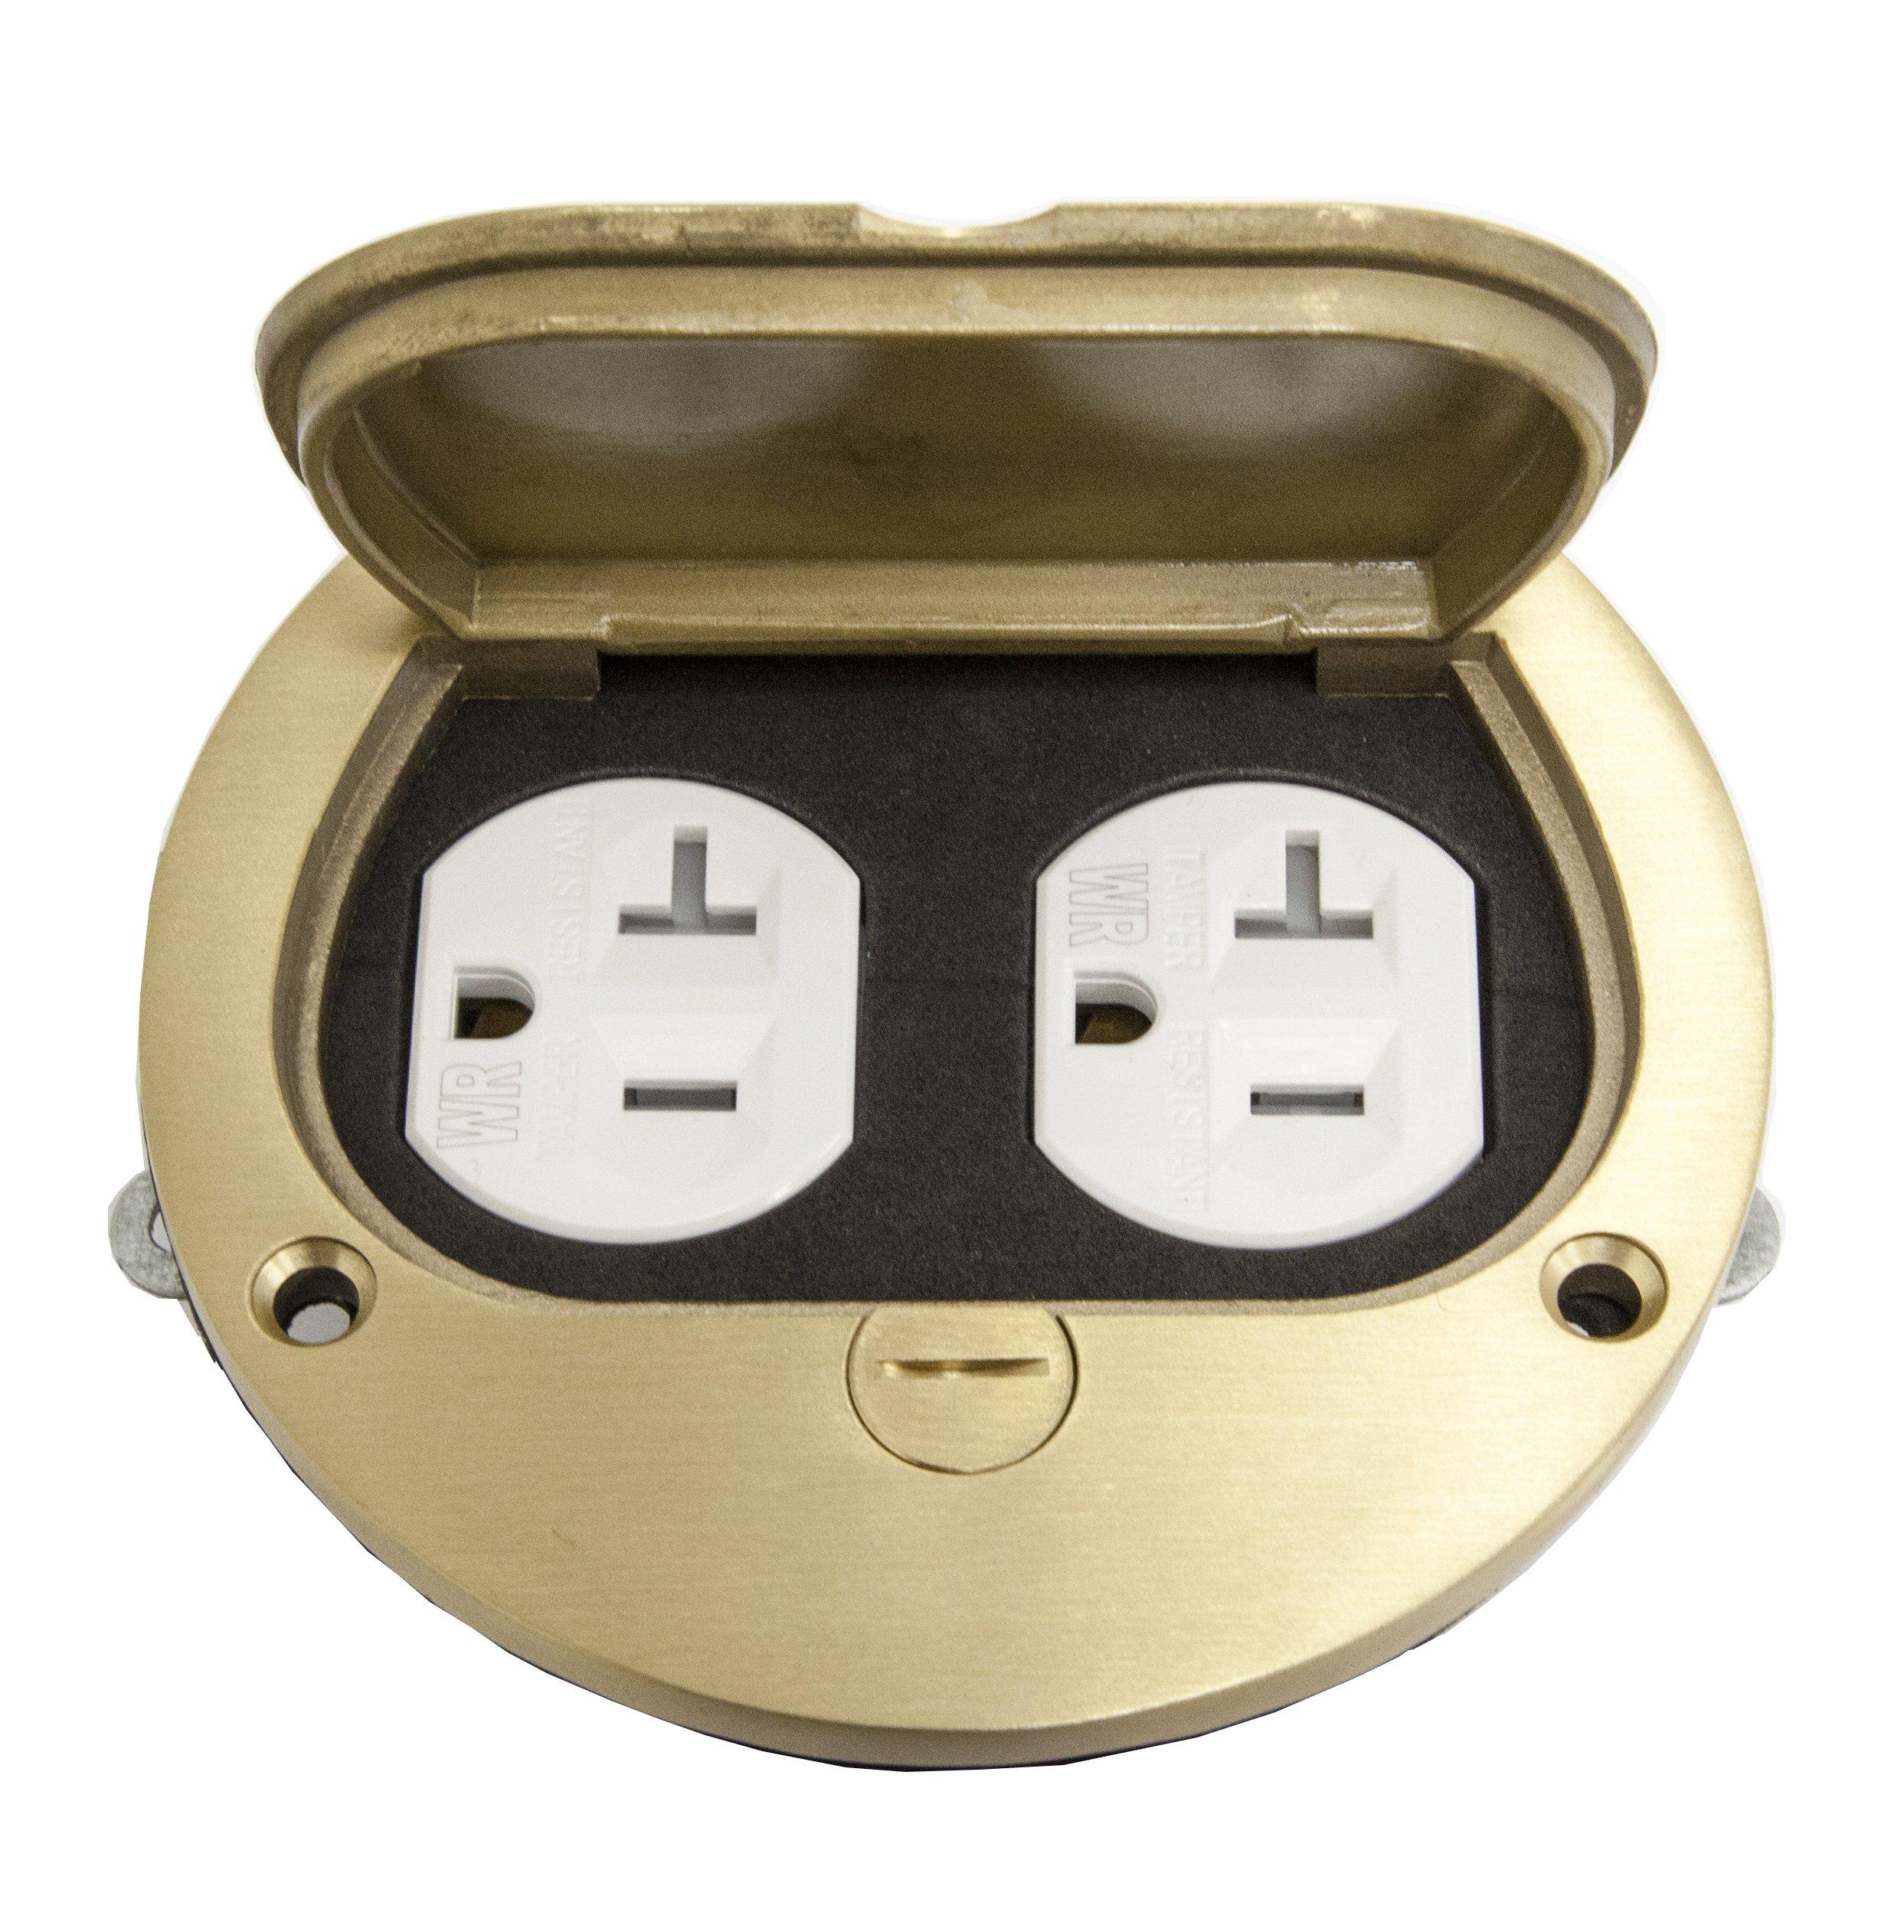 ENERLITES Brass Flip Lid Floor Box Cover, 4'' Diameter, includes 20A Tamper-Weather Resistant Duplex Receptacle & Watertight Gaskets, PN: 975502-C, UL Listed